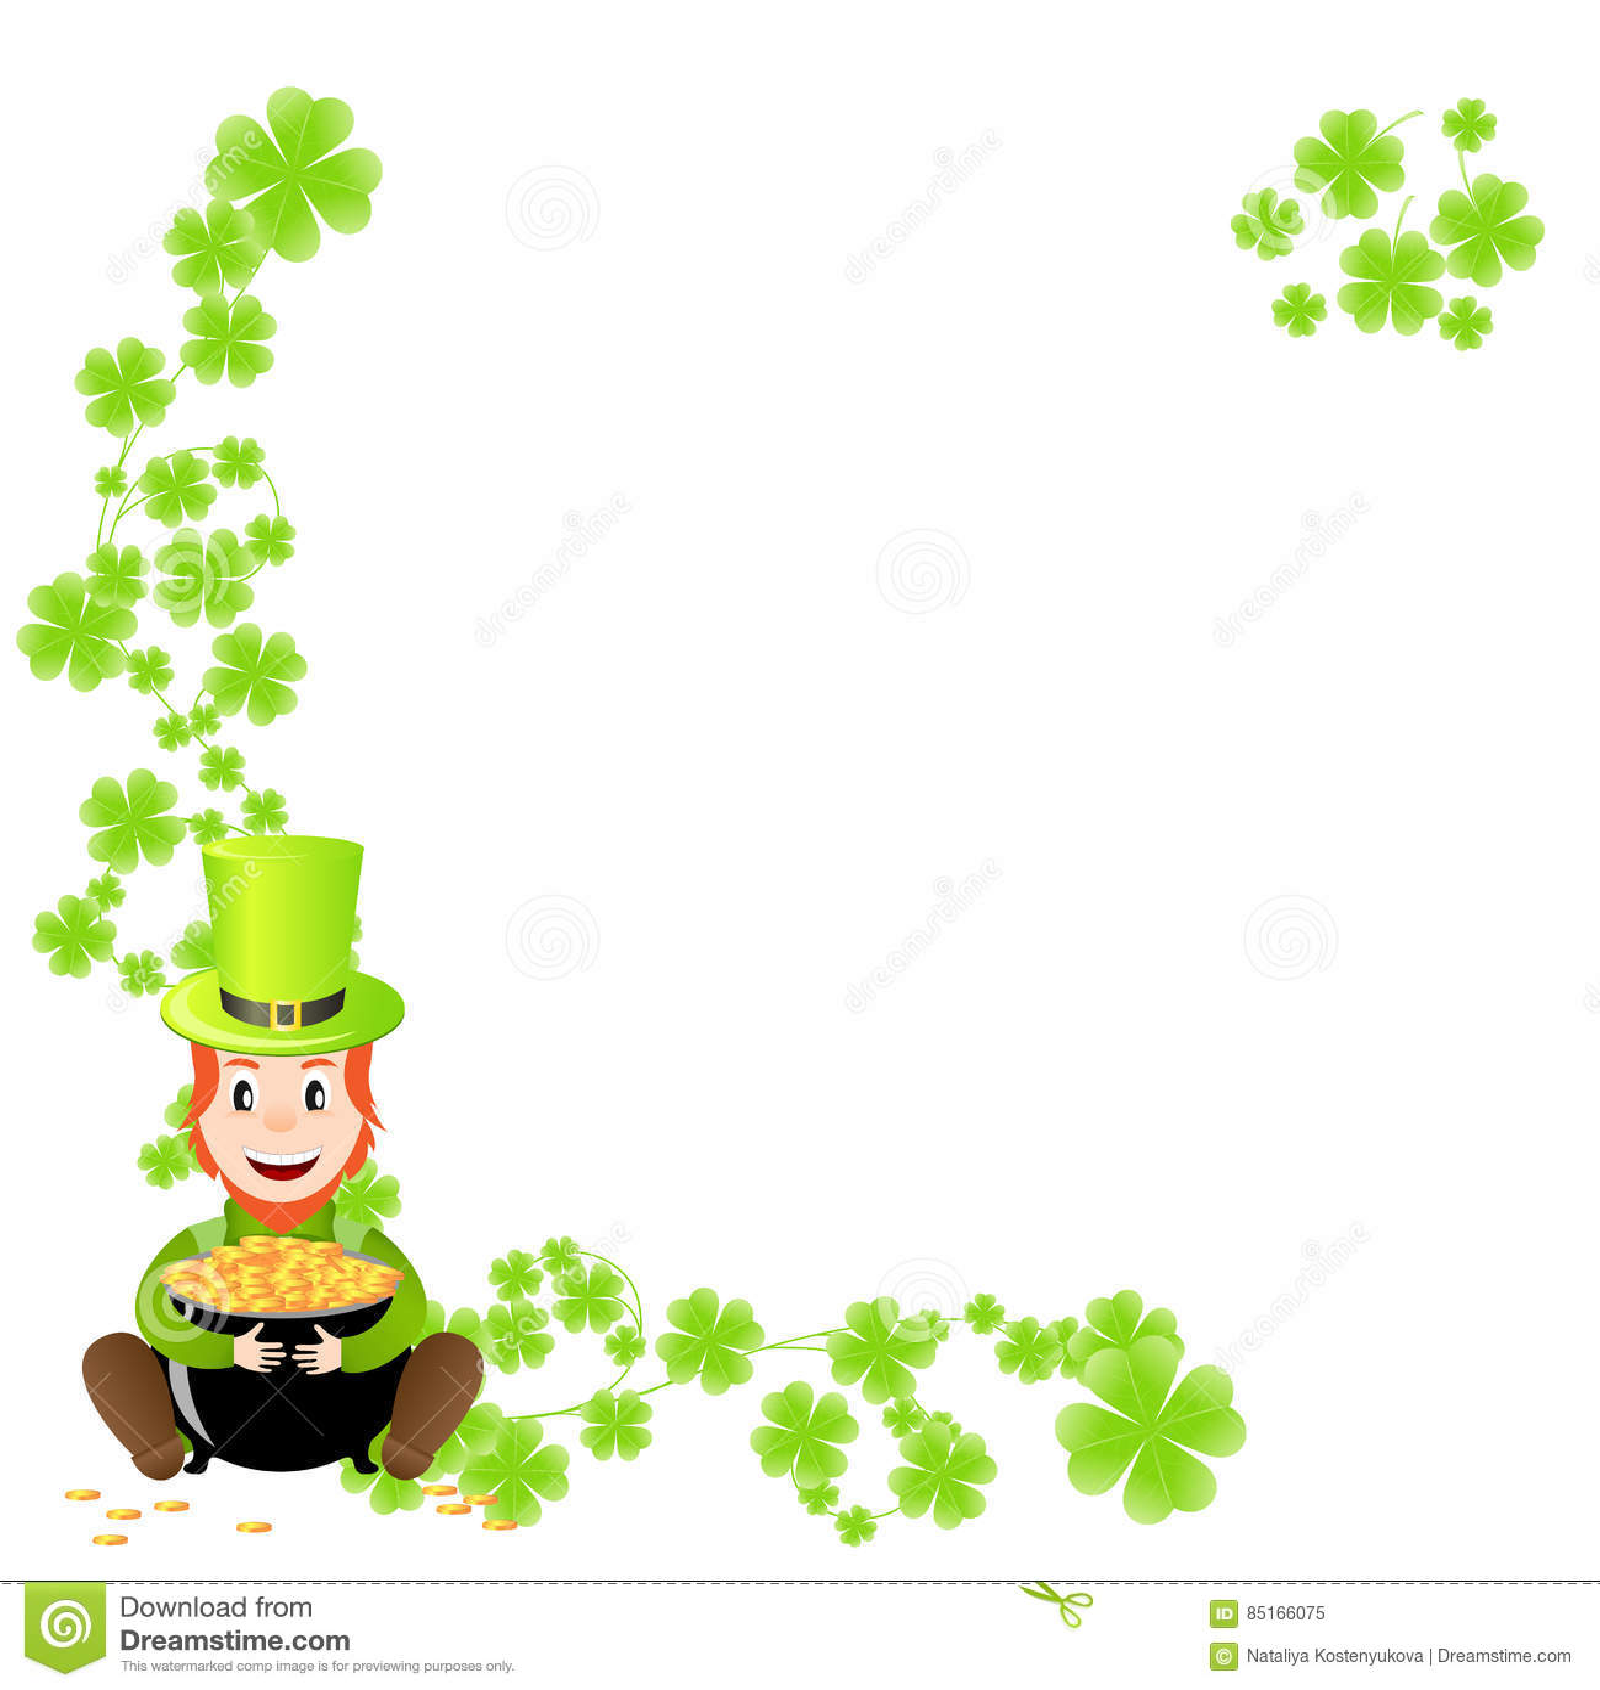 Pot Of Gold Template | St Patricks Template Stock Vector Illustration Of Illustration